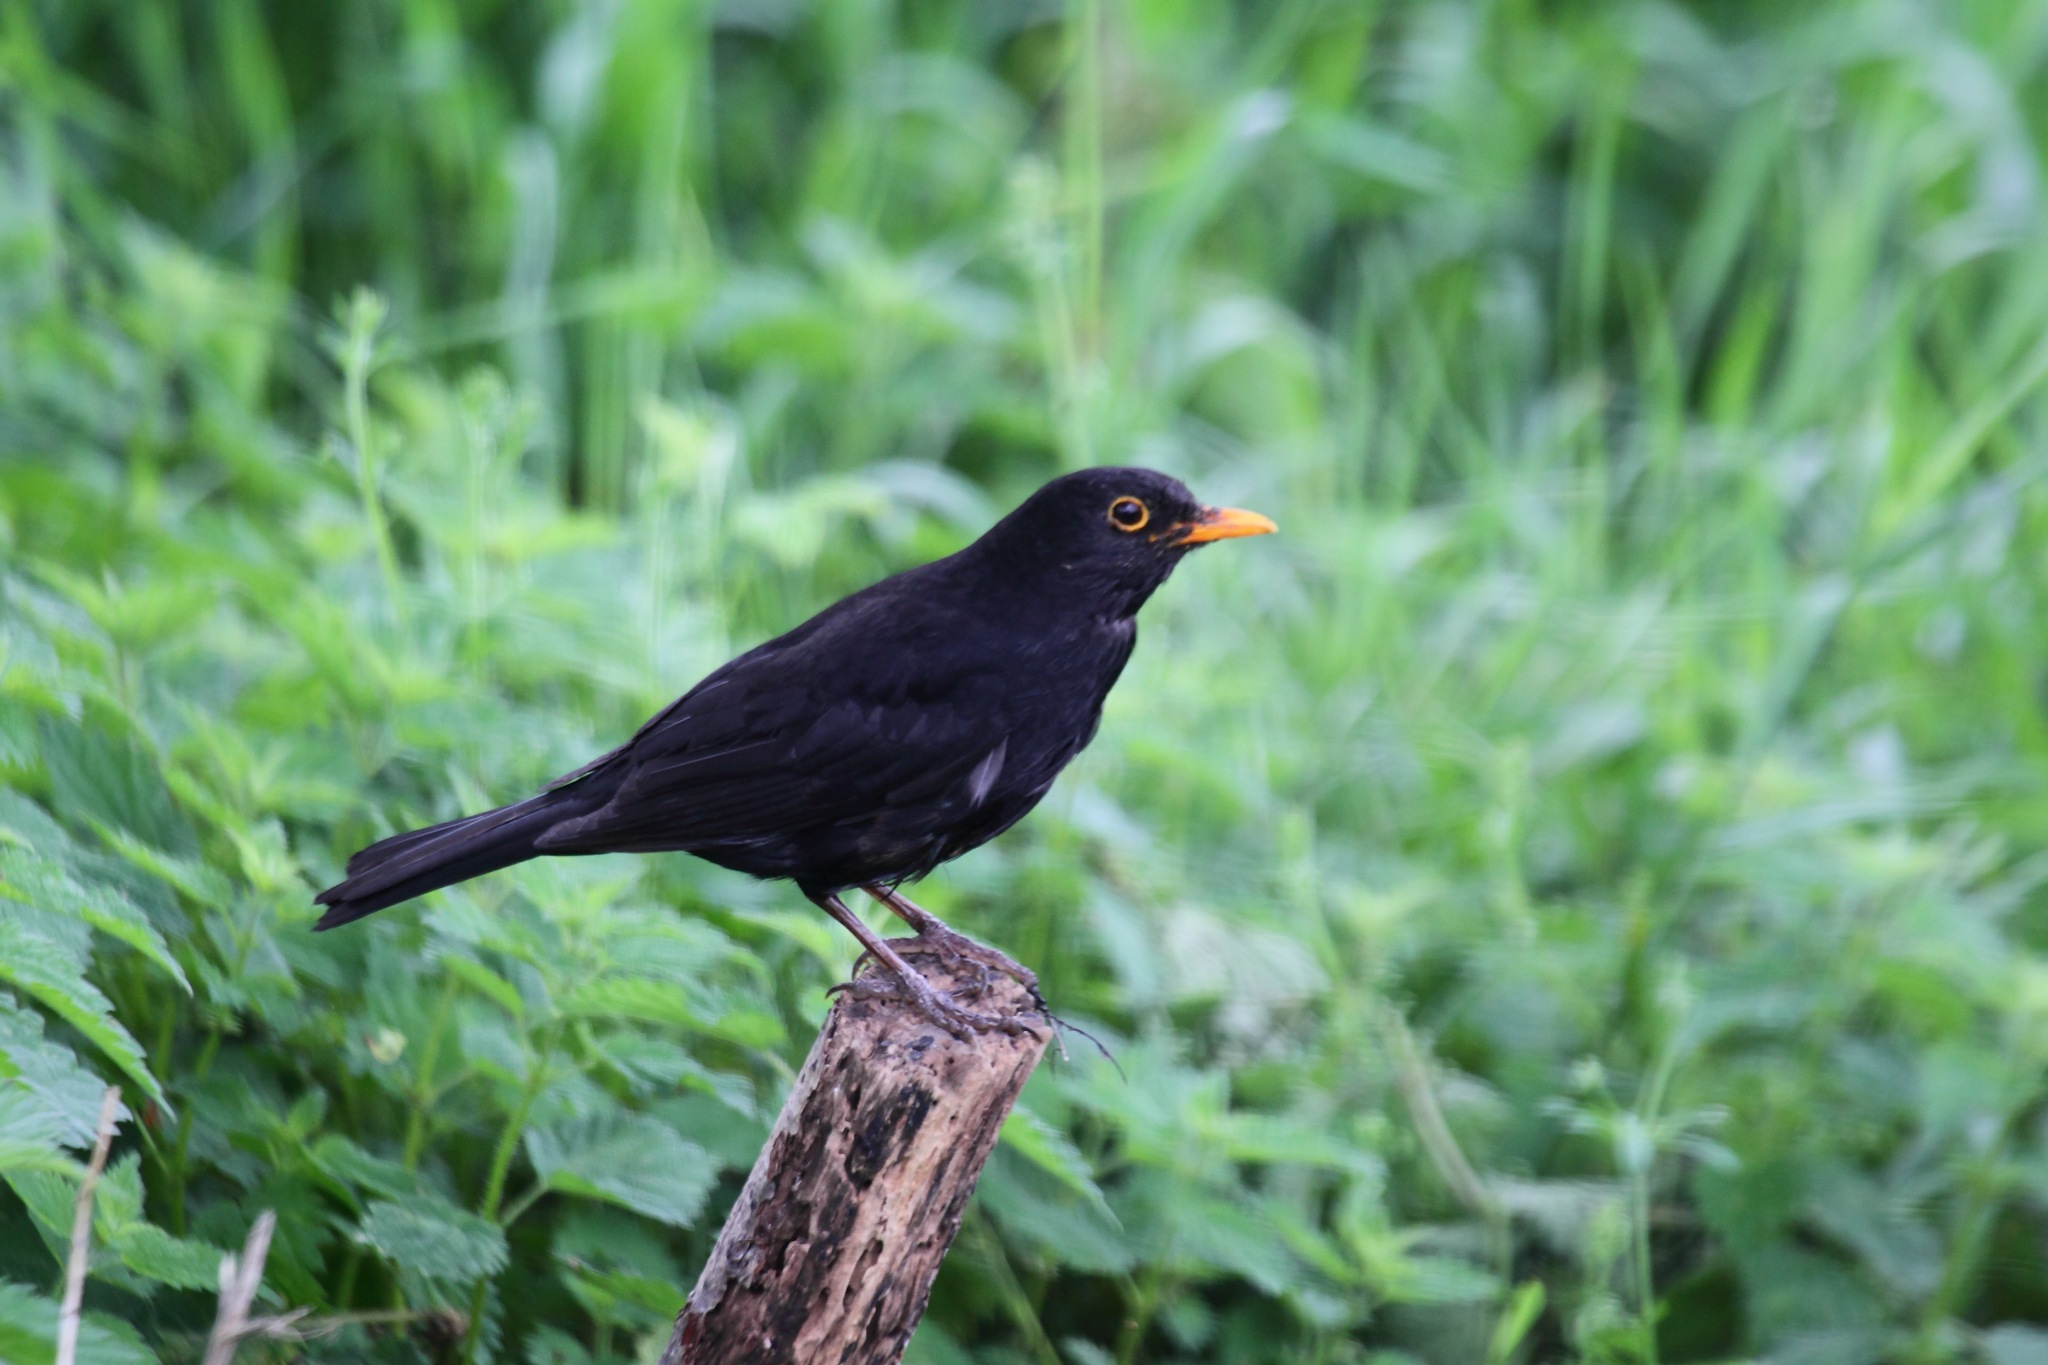 Blackbird by Philip Watson